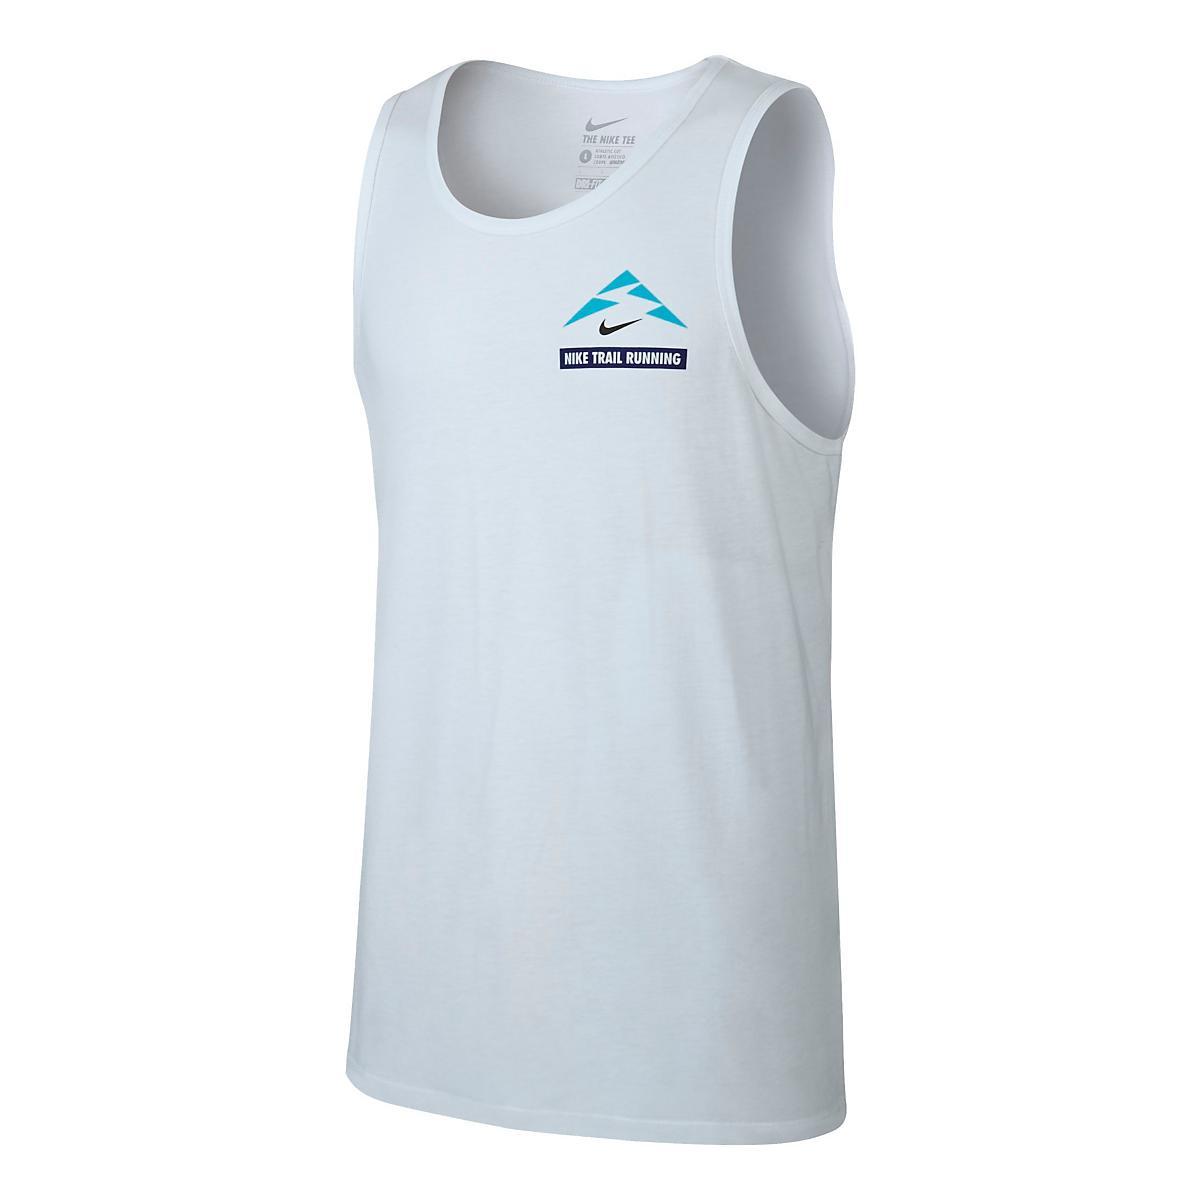 6dc01e88e784d Mens Nike Run Trail Running Sleeveless   Tank Technical Tops at Road Runner  Sports